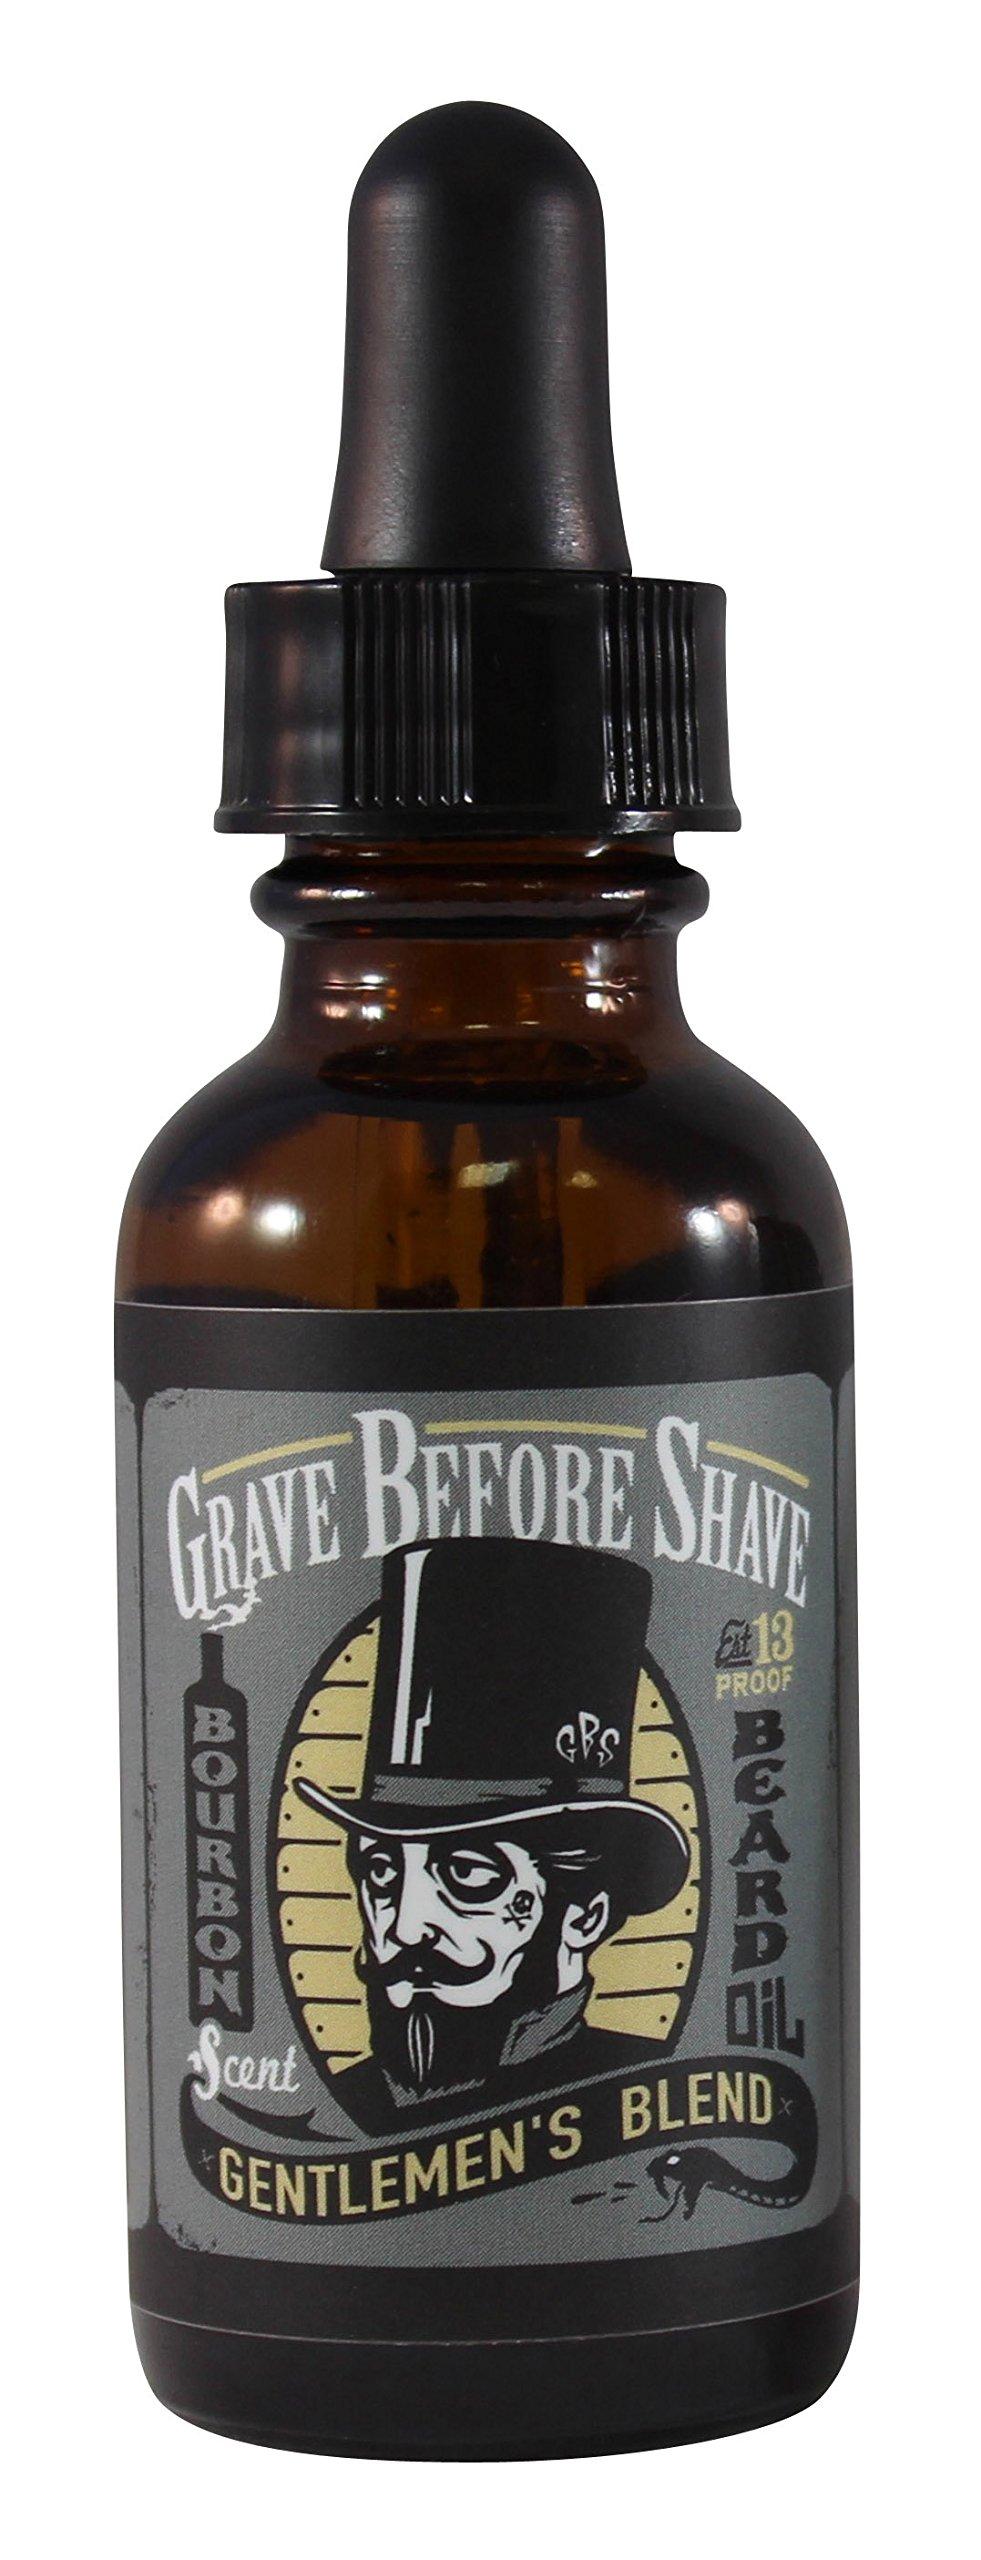 GRAVE BEFORE SHAVE Gentlemen's Blend Beard Oil (Bourbon Scent)